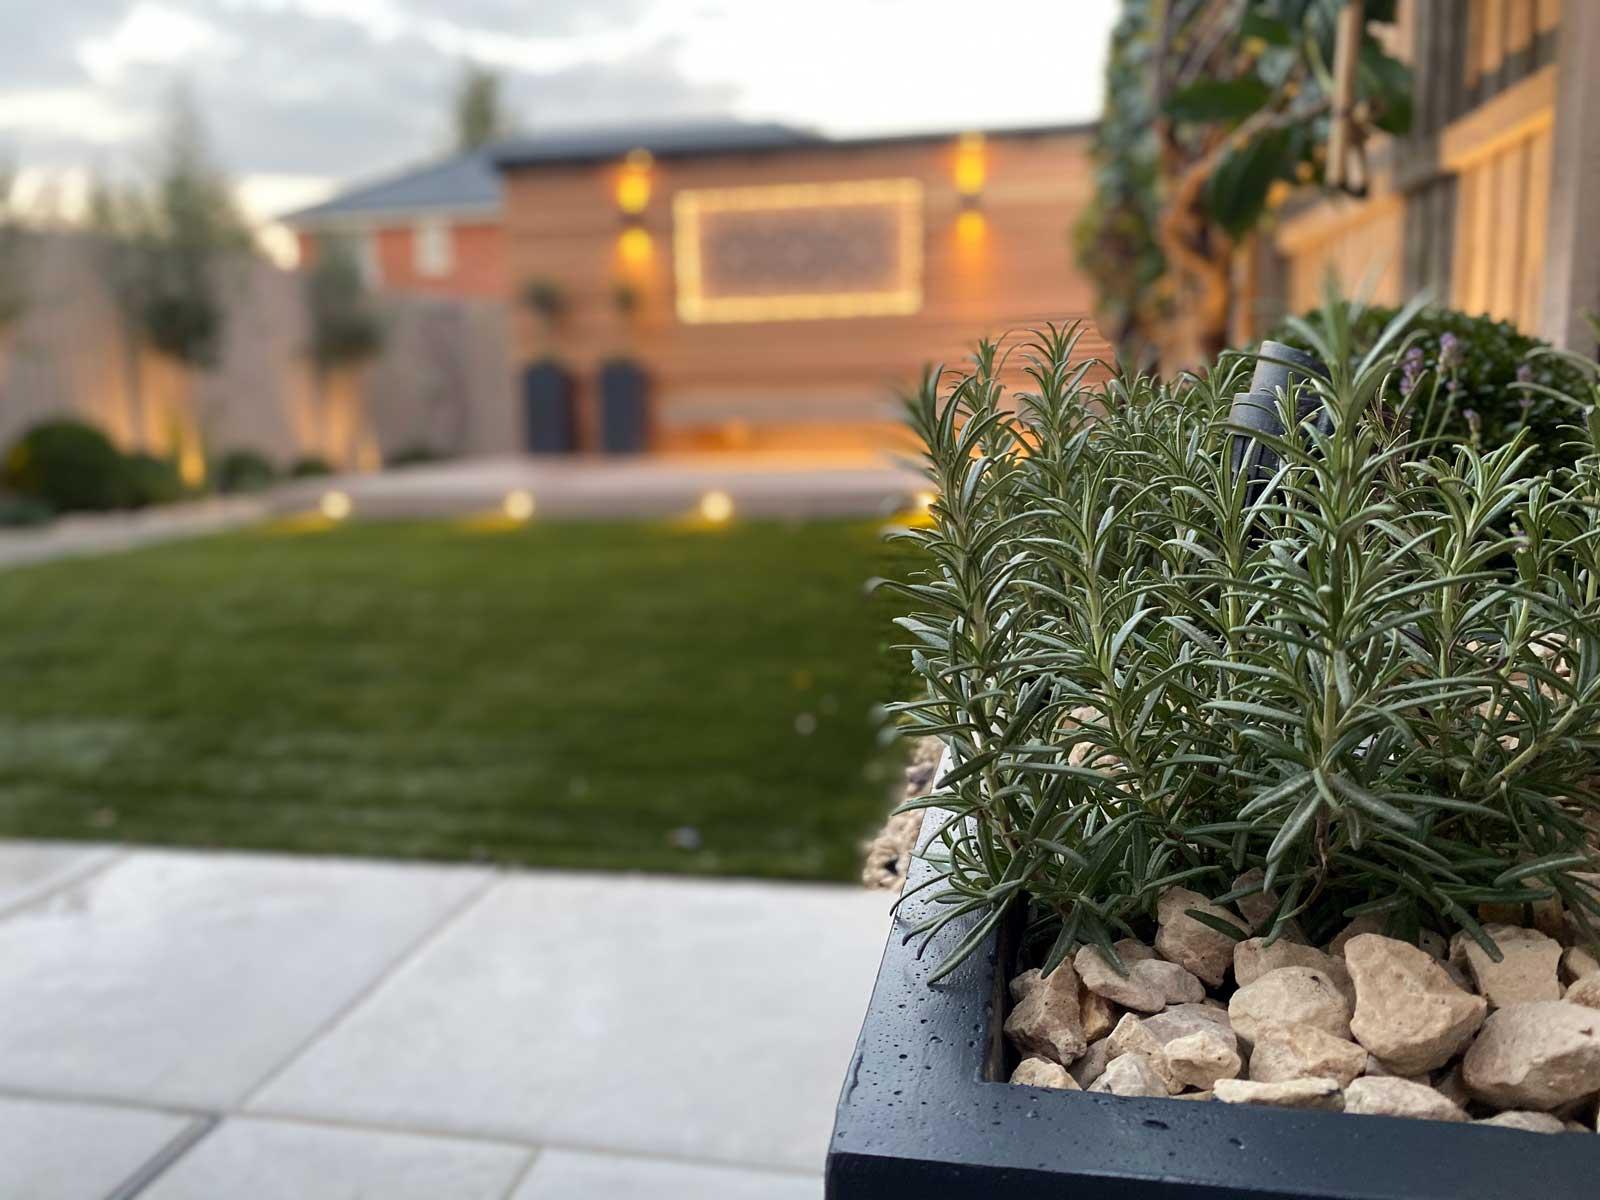 Back Garden in Radlett - planter with herbs